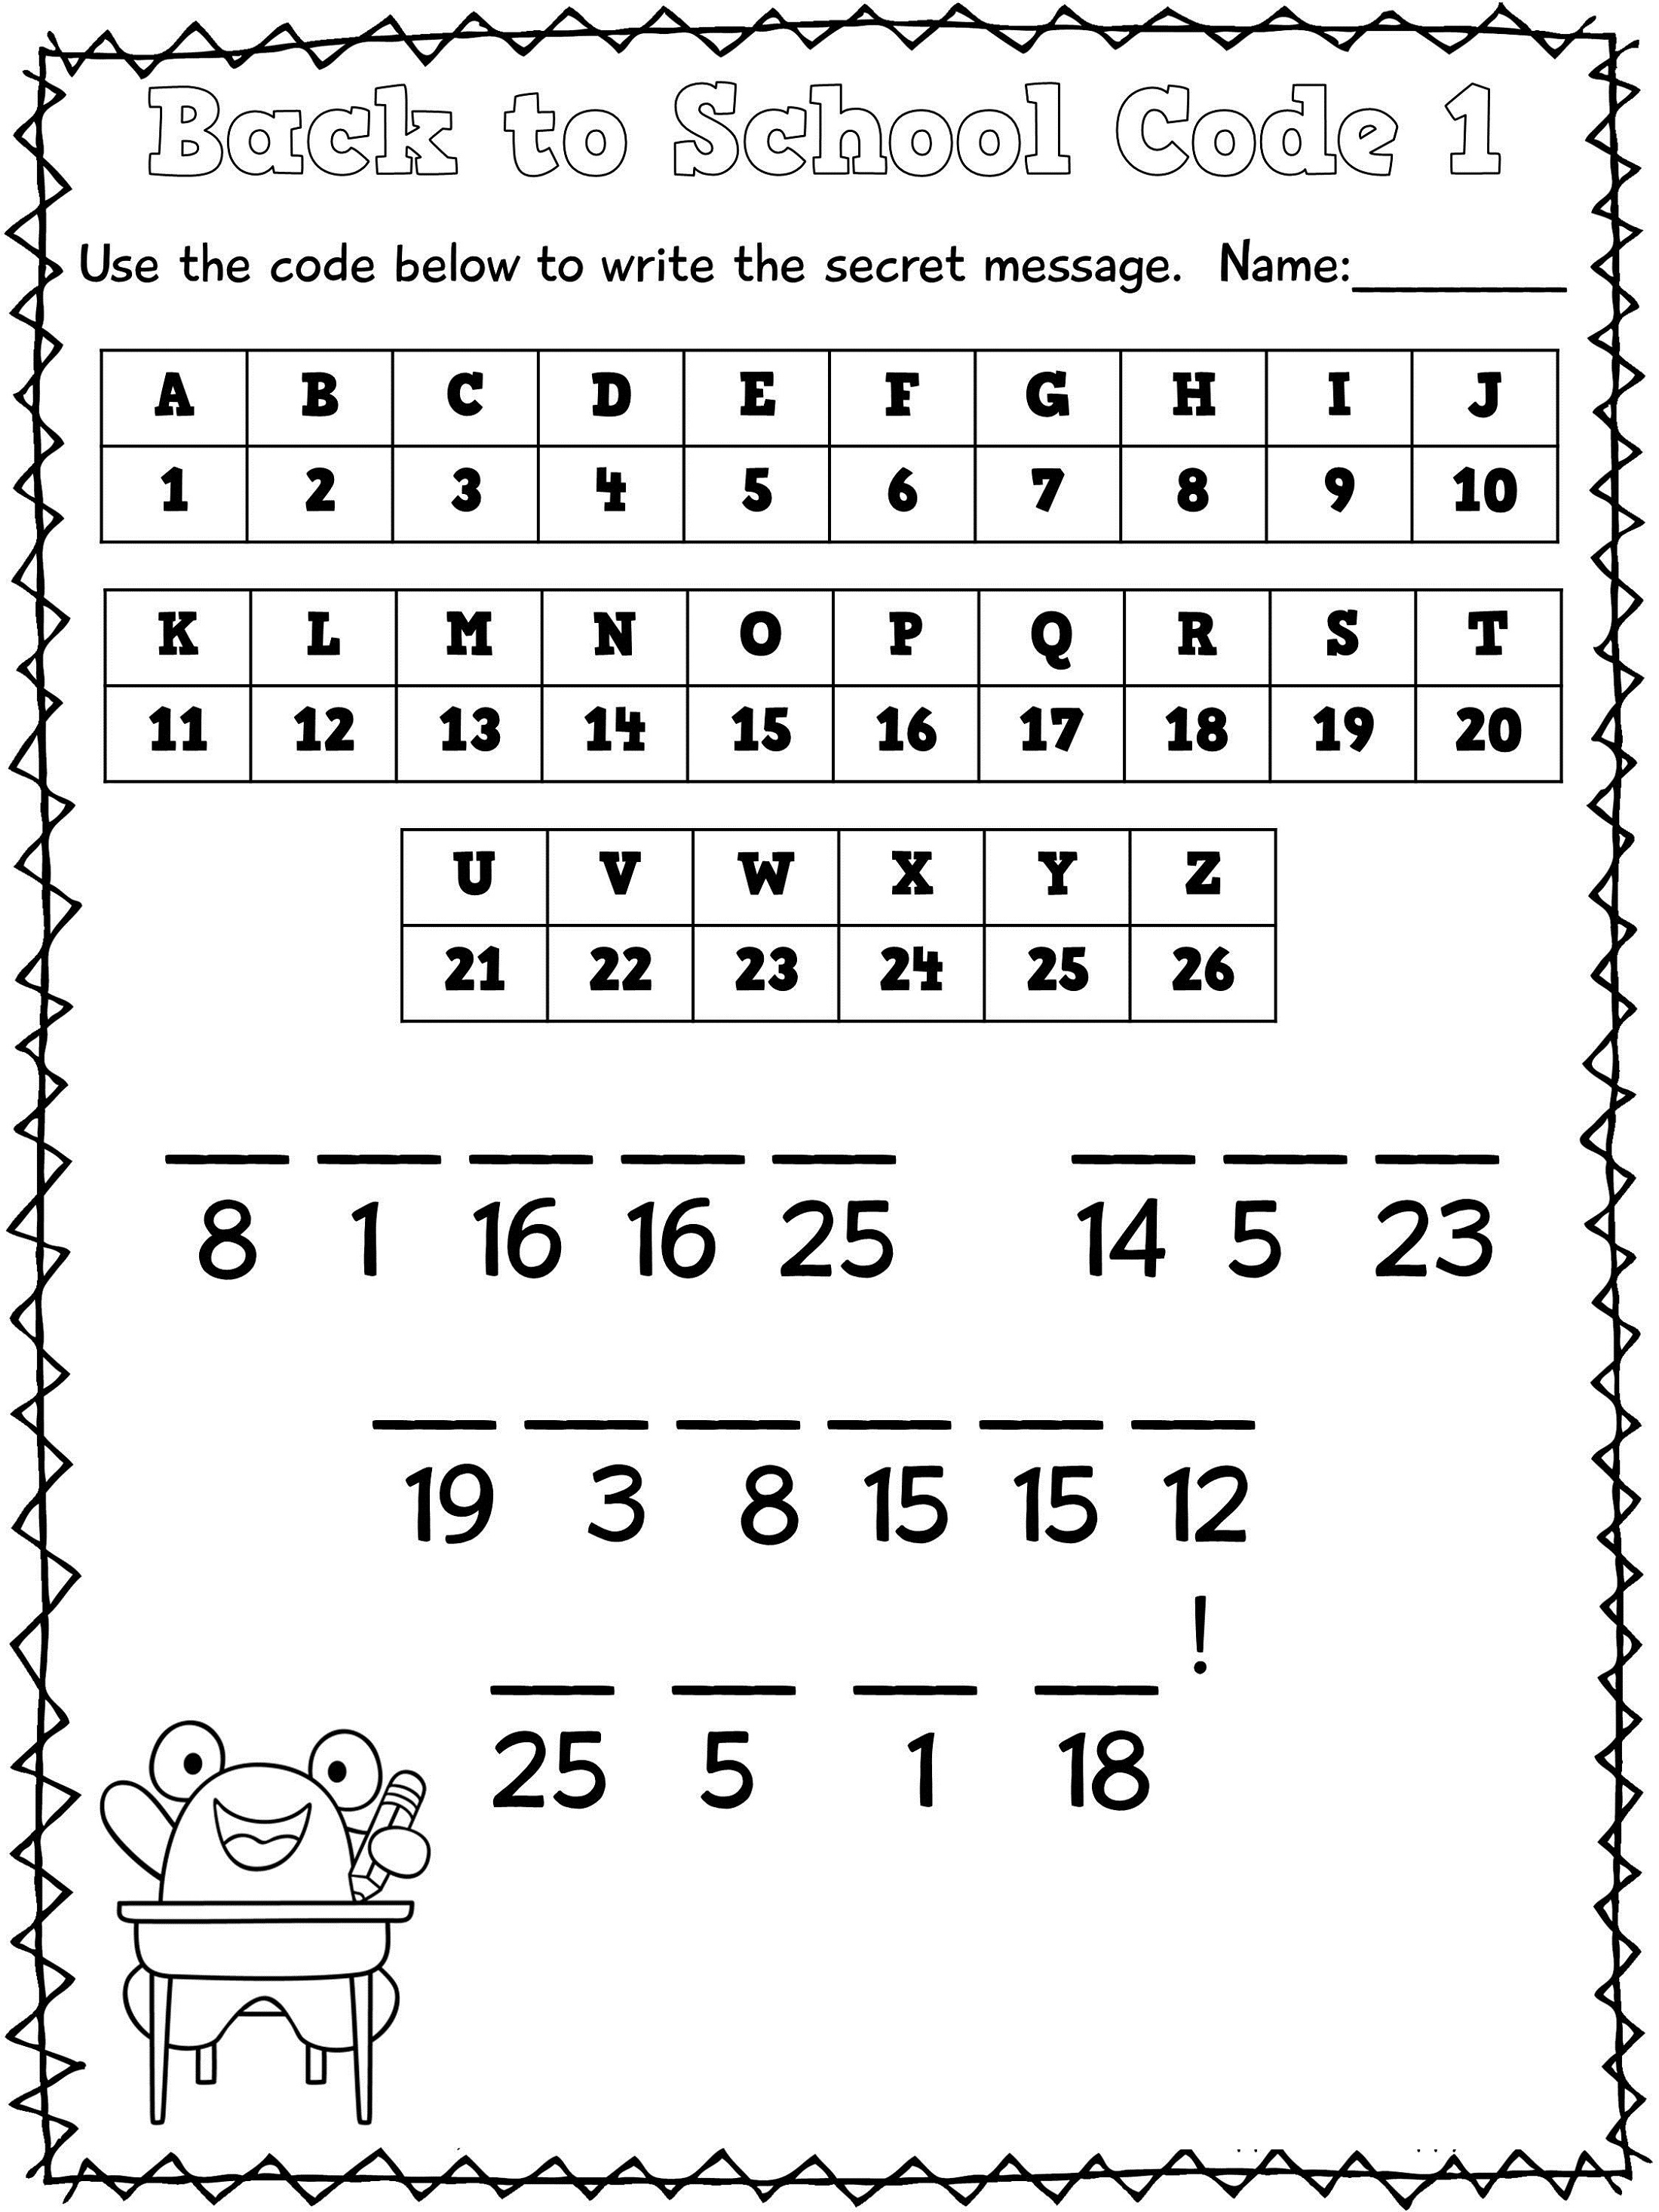 School Math Worksheets To Print 1st Grade